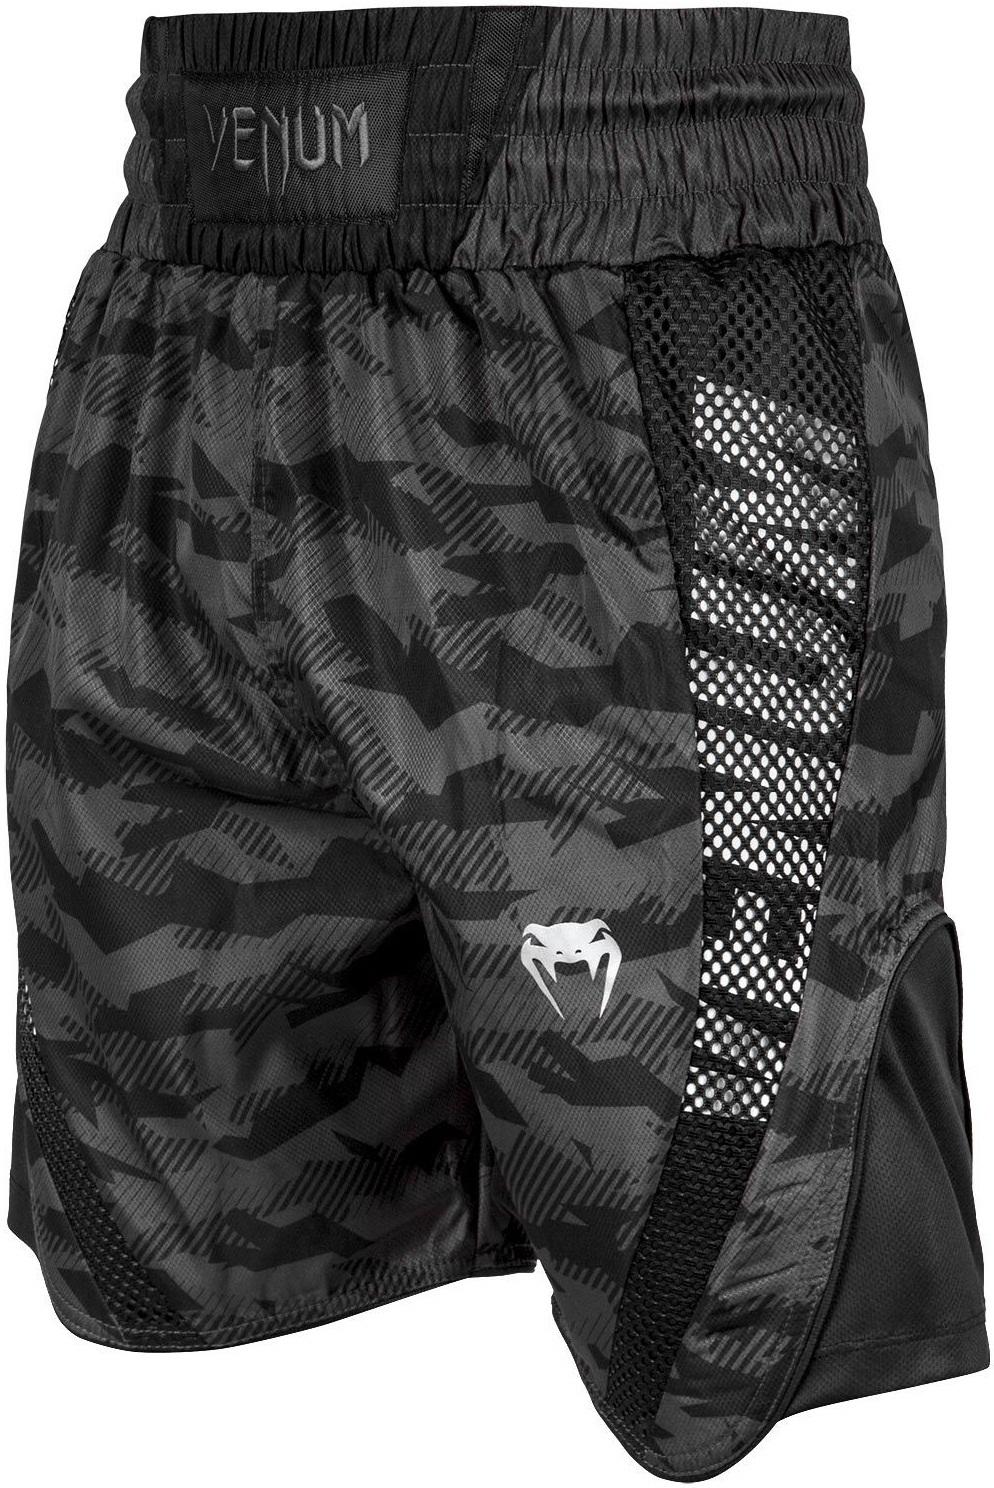 Шорты Шорты Venum Elite Boxing Shorts - Urban Camo/Black 1.jpg